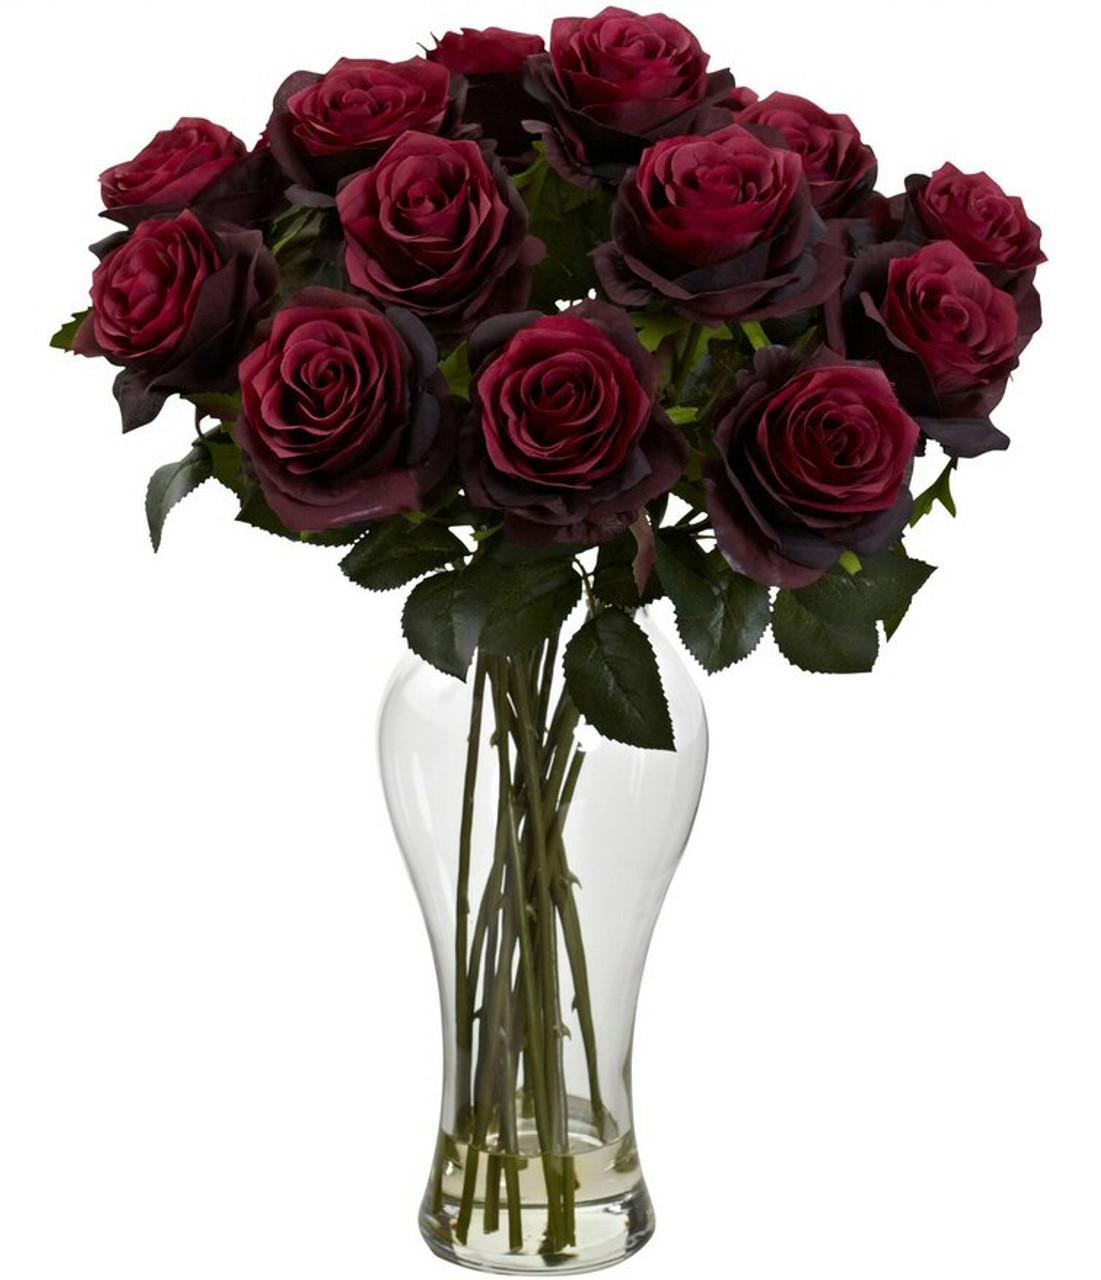 242 & Blooming Burgundy Roses Silk Flower Arrangement with Vase